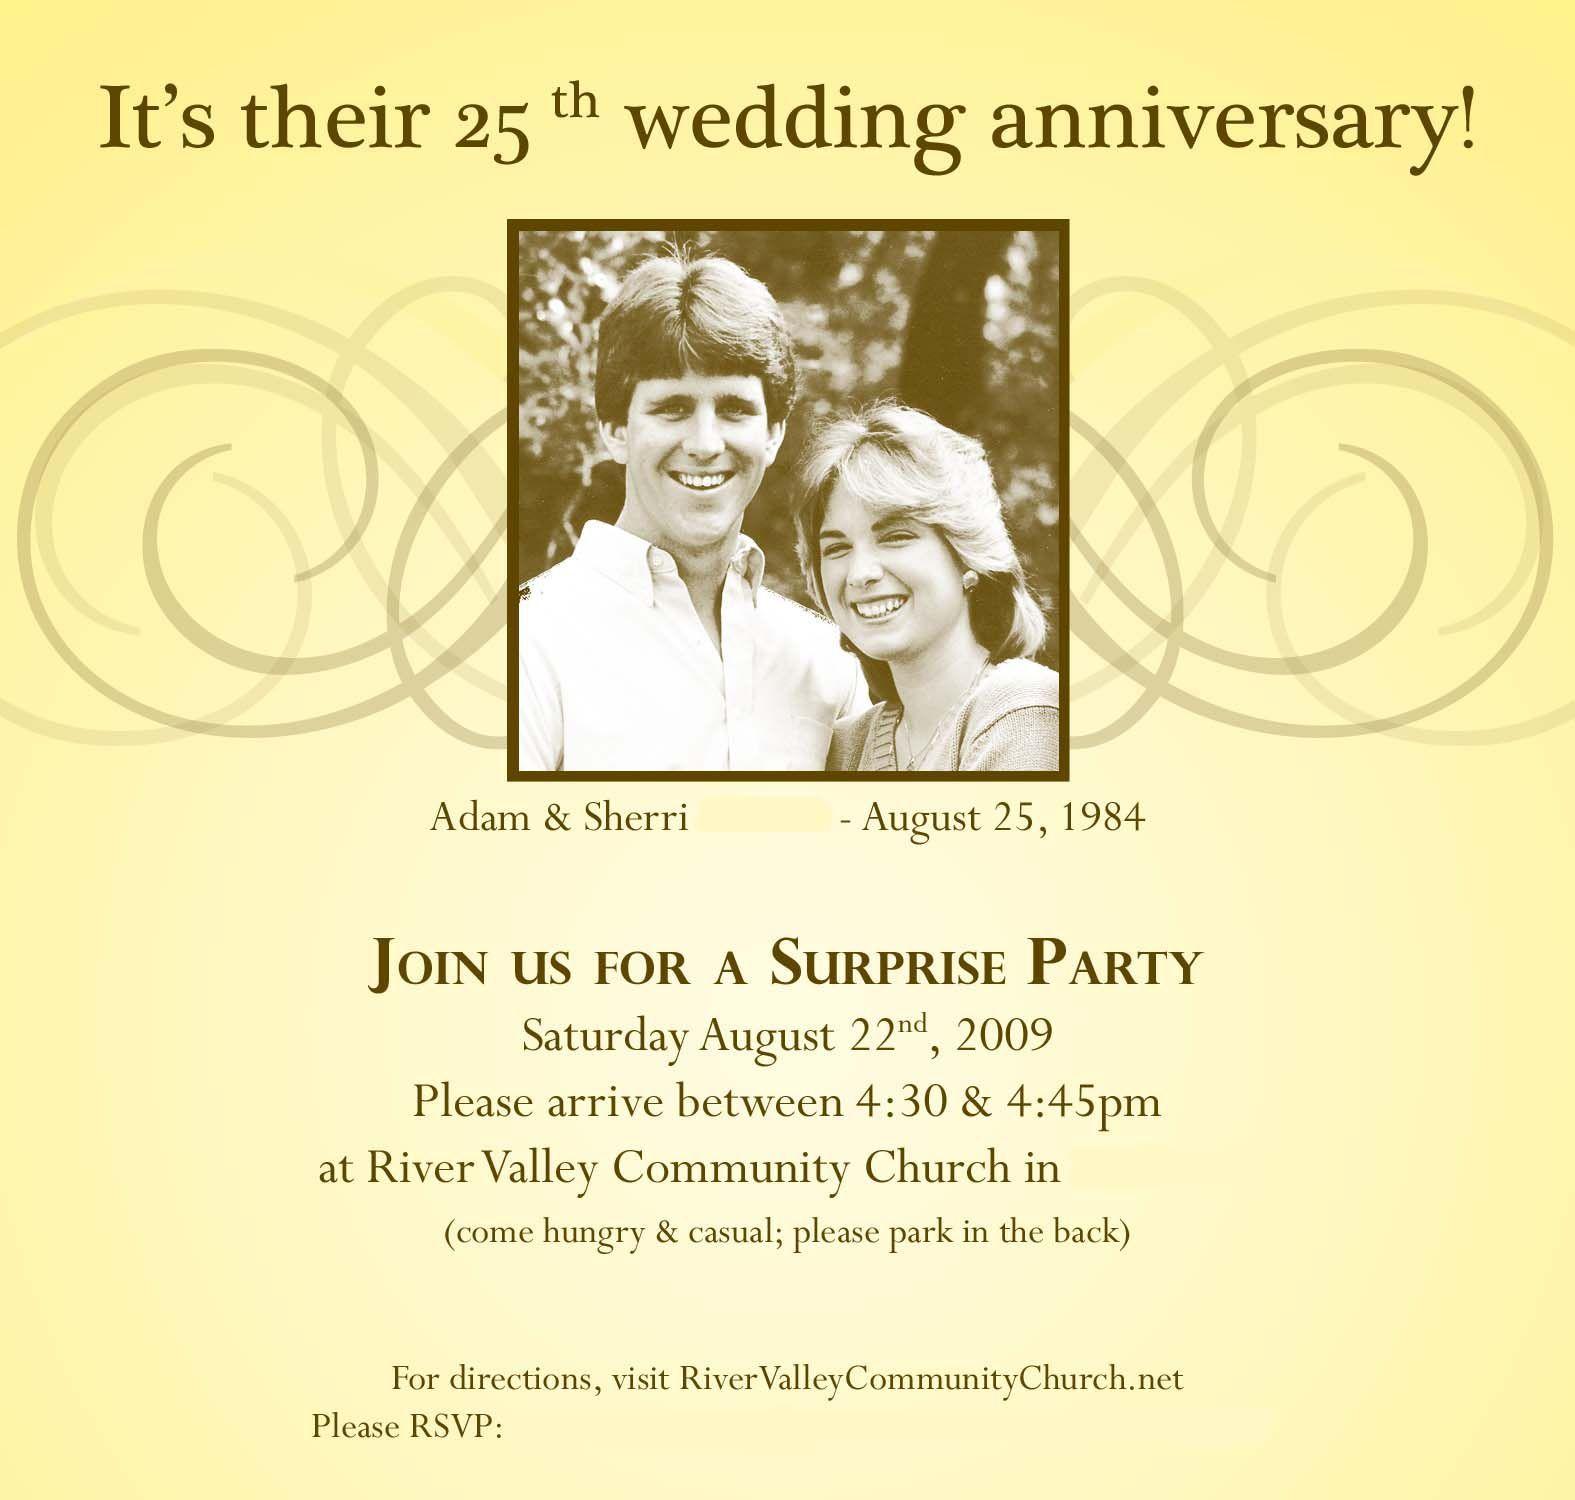 25th wedding anniversary surprise party invitations | wedding ...